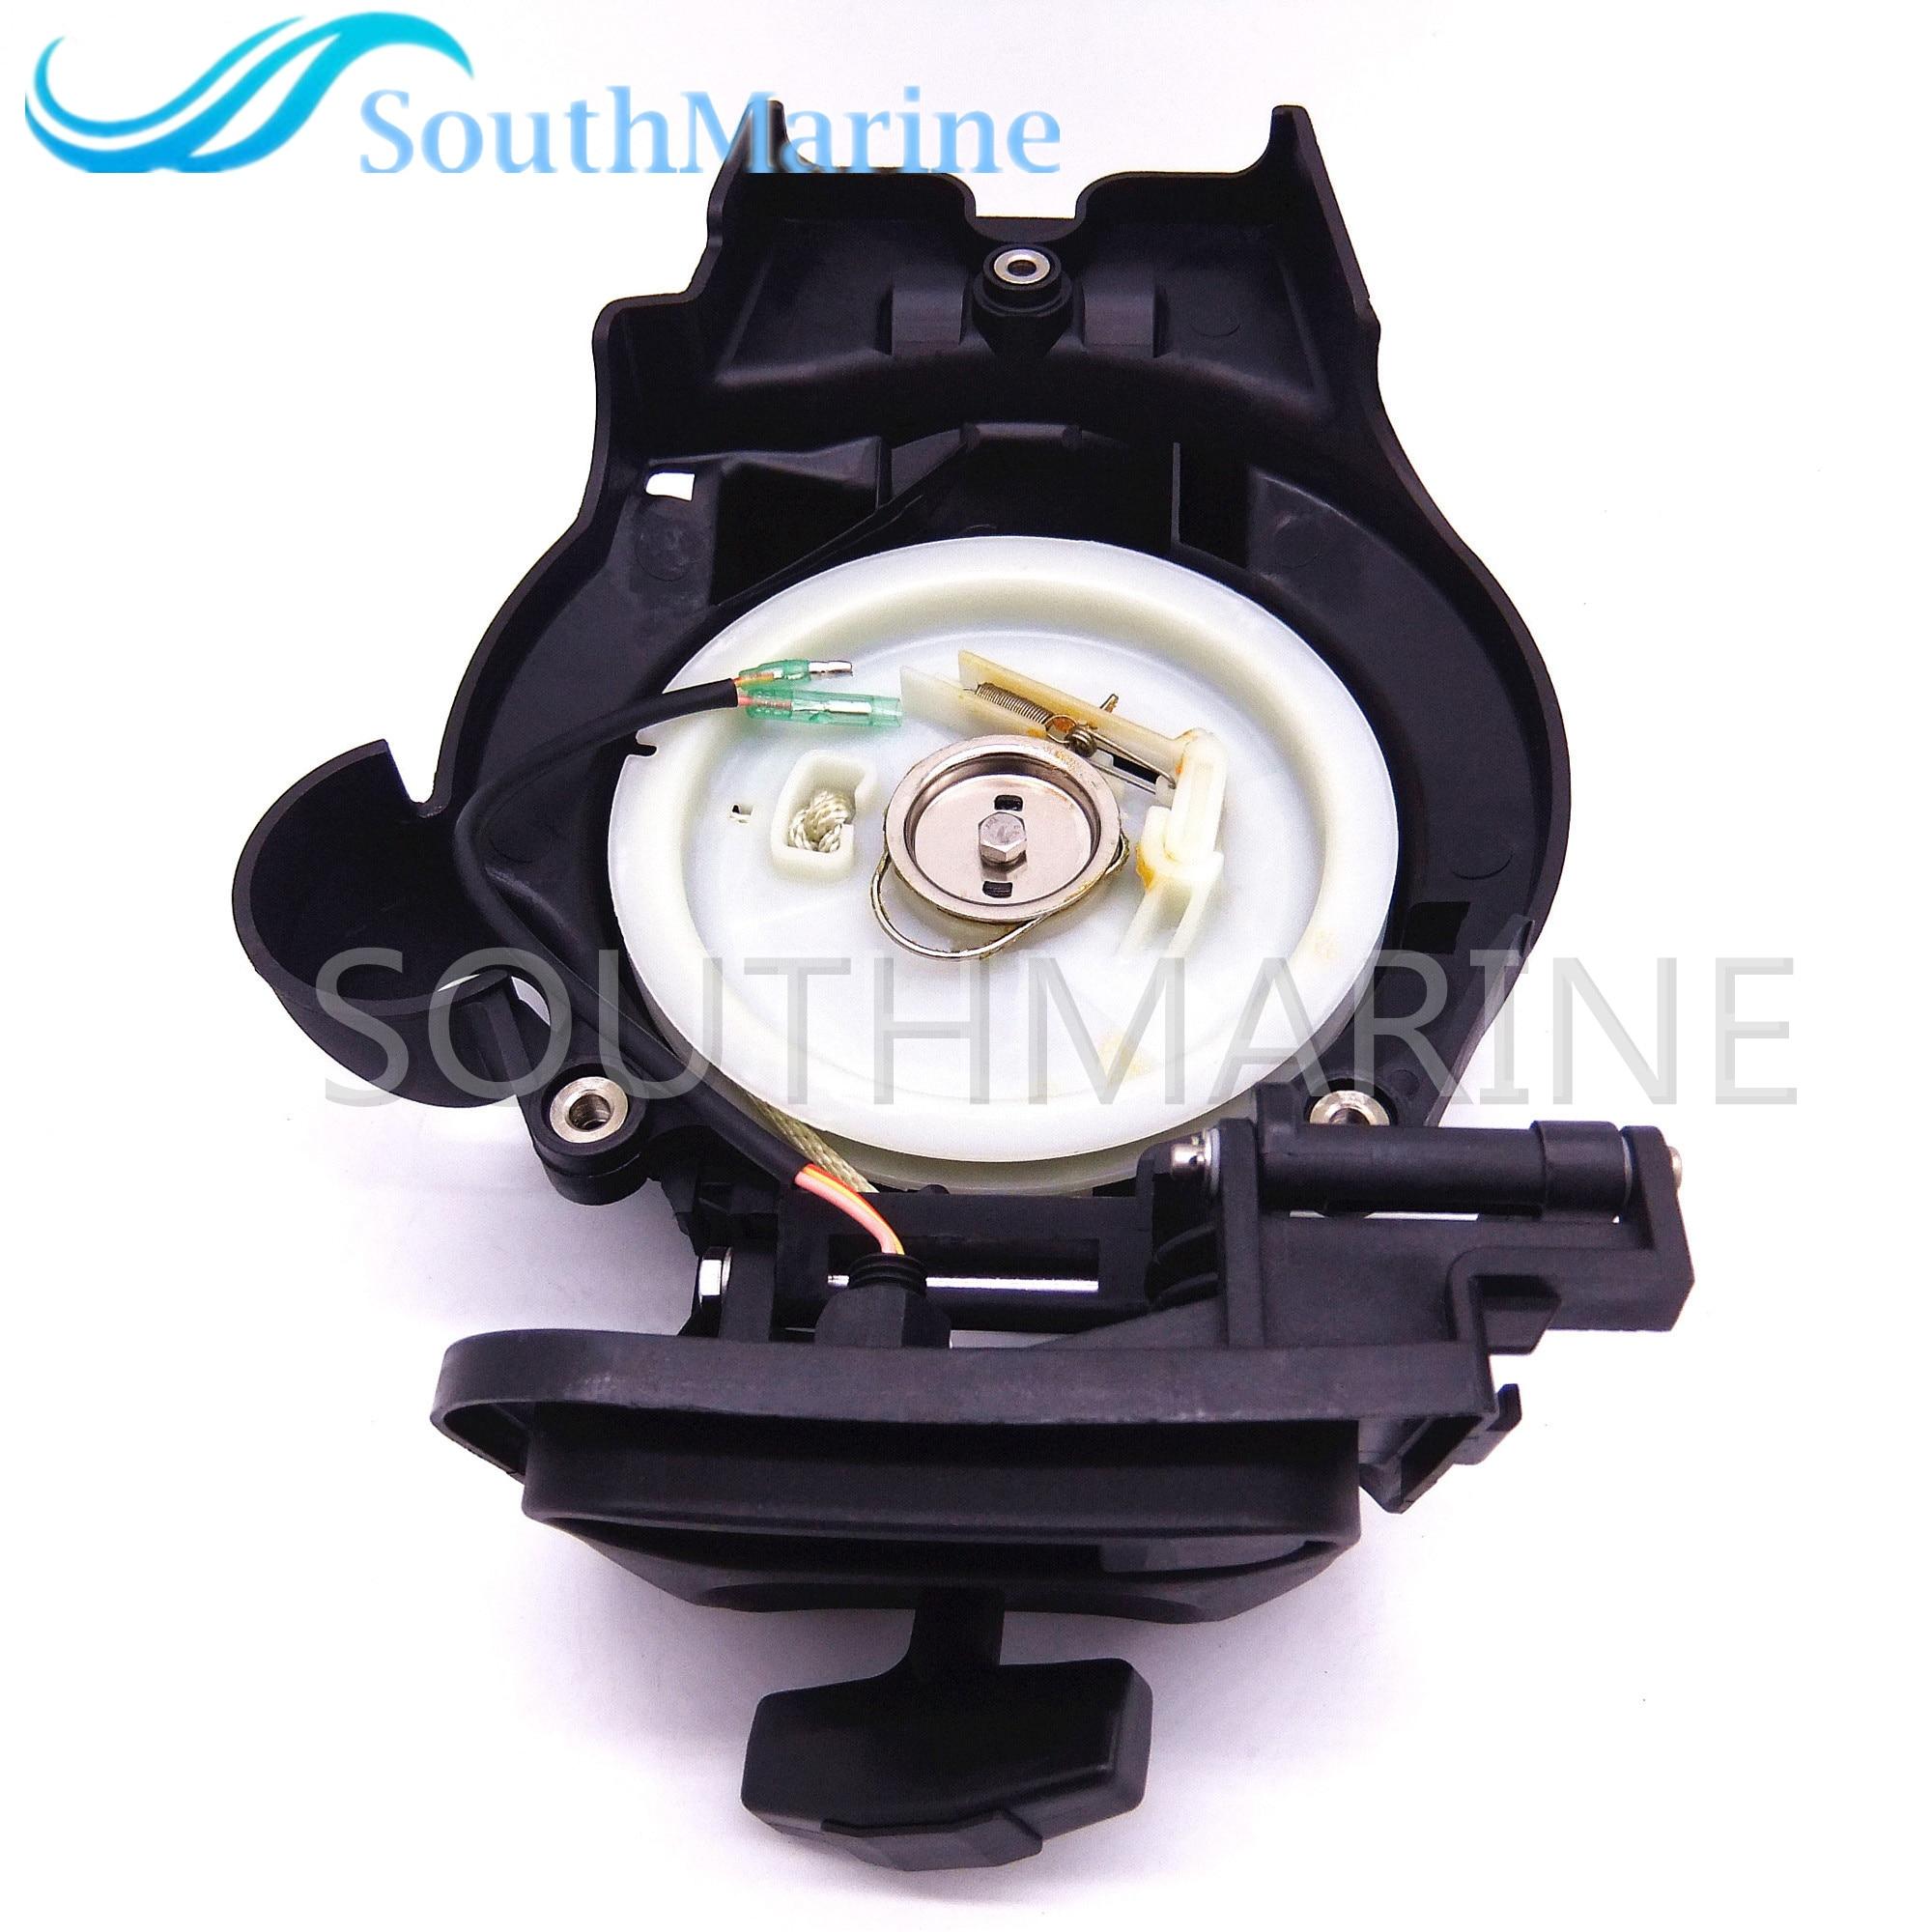 купить Starter Assy F15-07130000 for Parsun HDX F15 F9.9 4-stroke Outboard Motors недорого